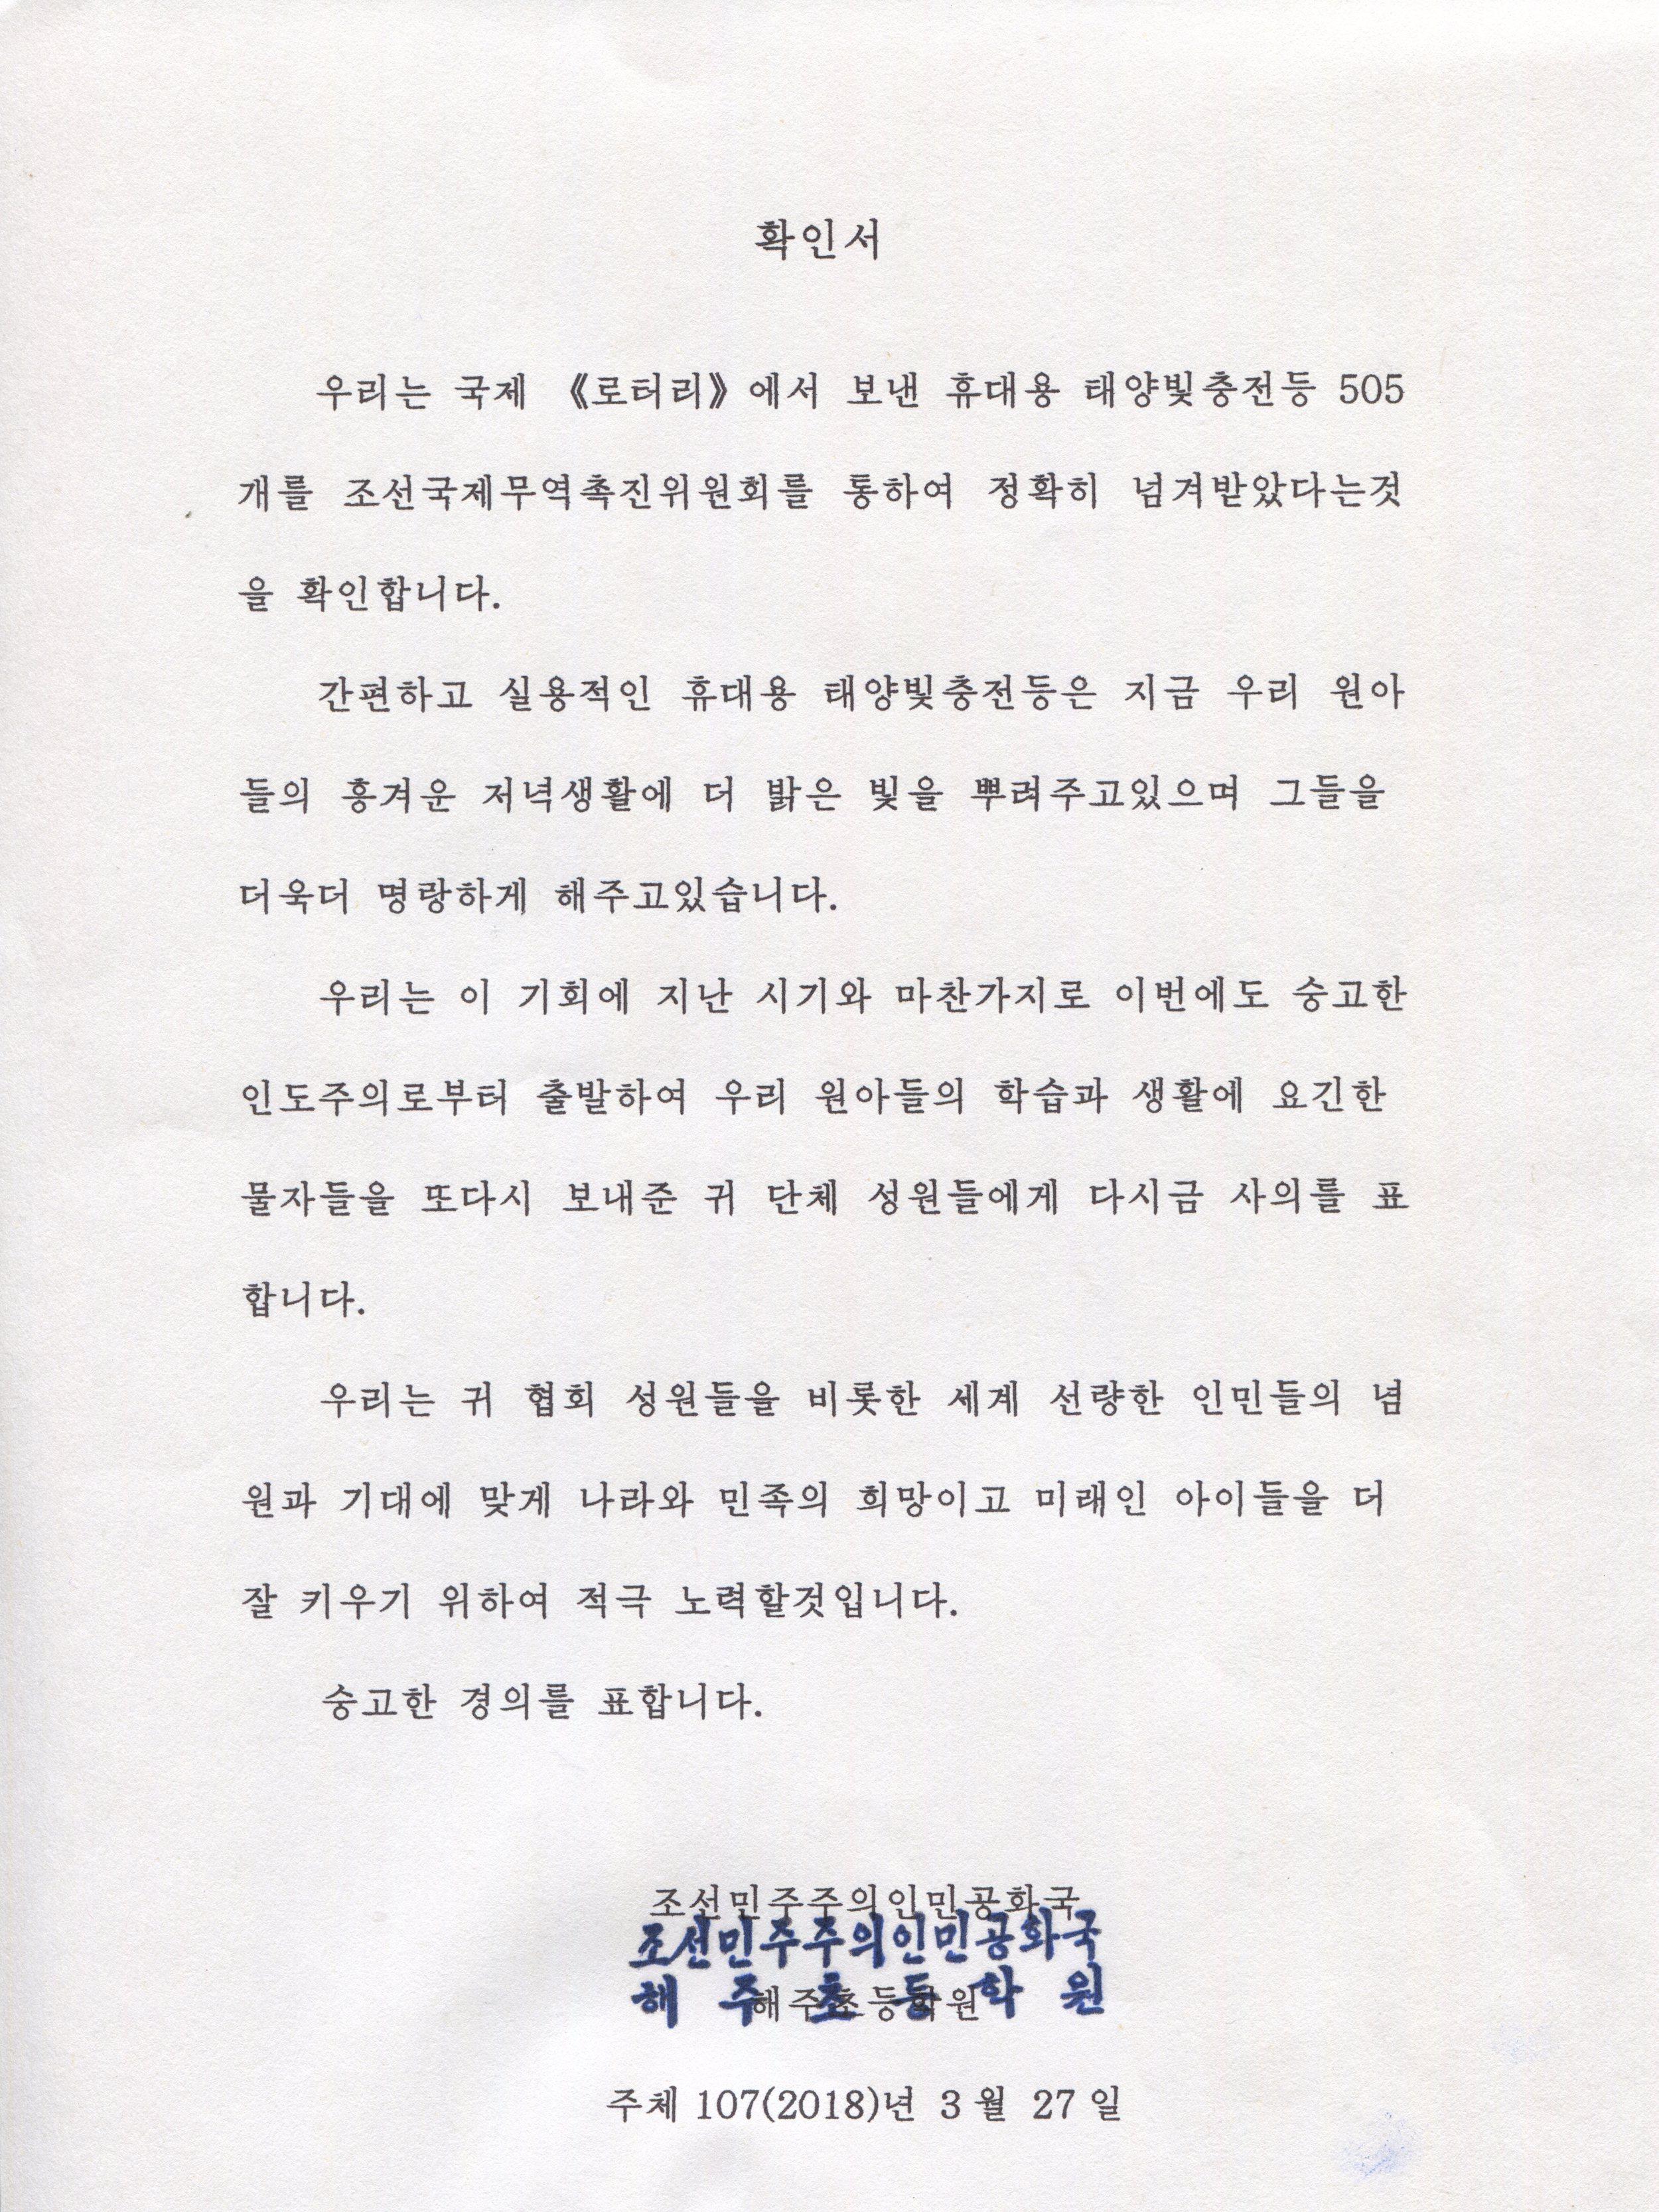 Haeju Orphans (Junior) School's Doc 2500px.jpeg